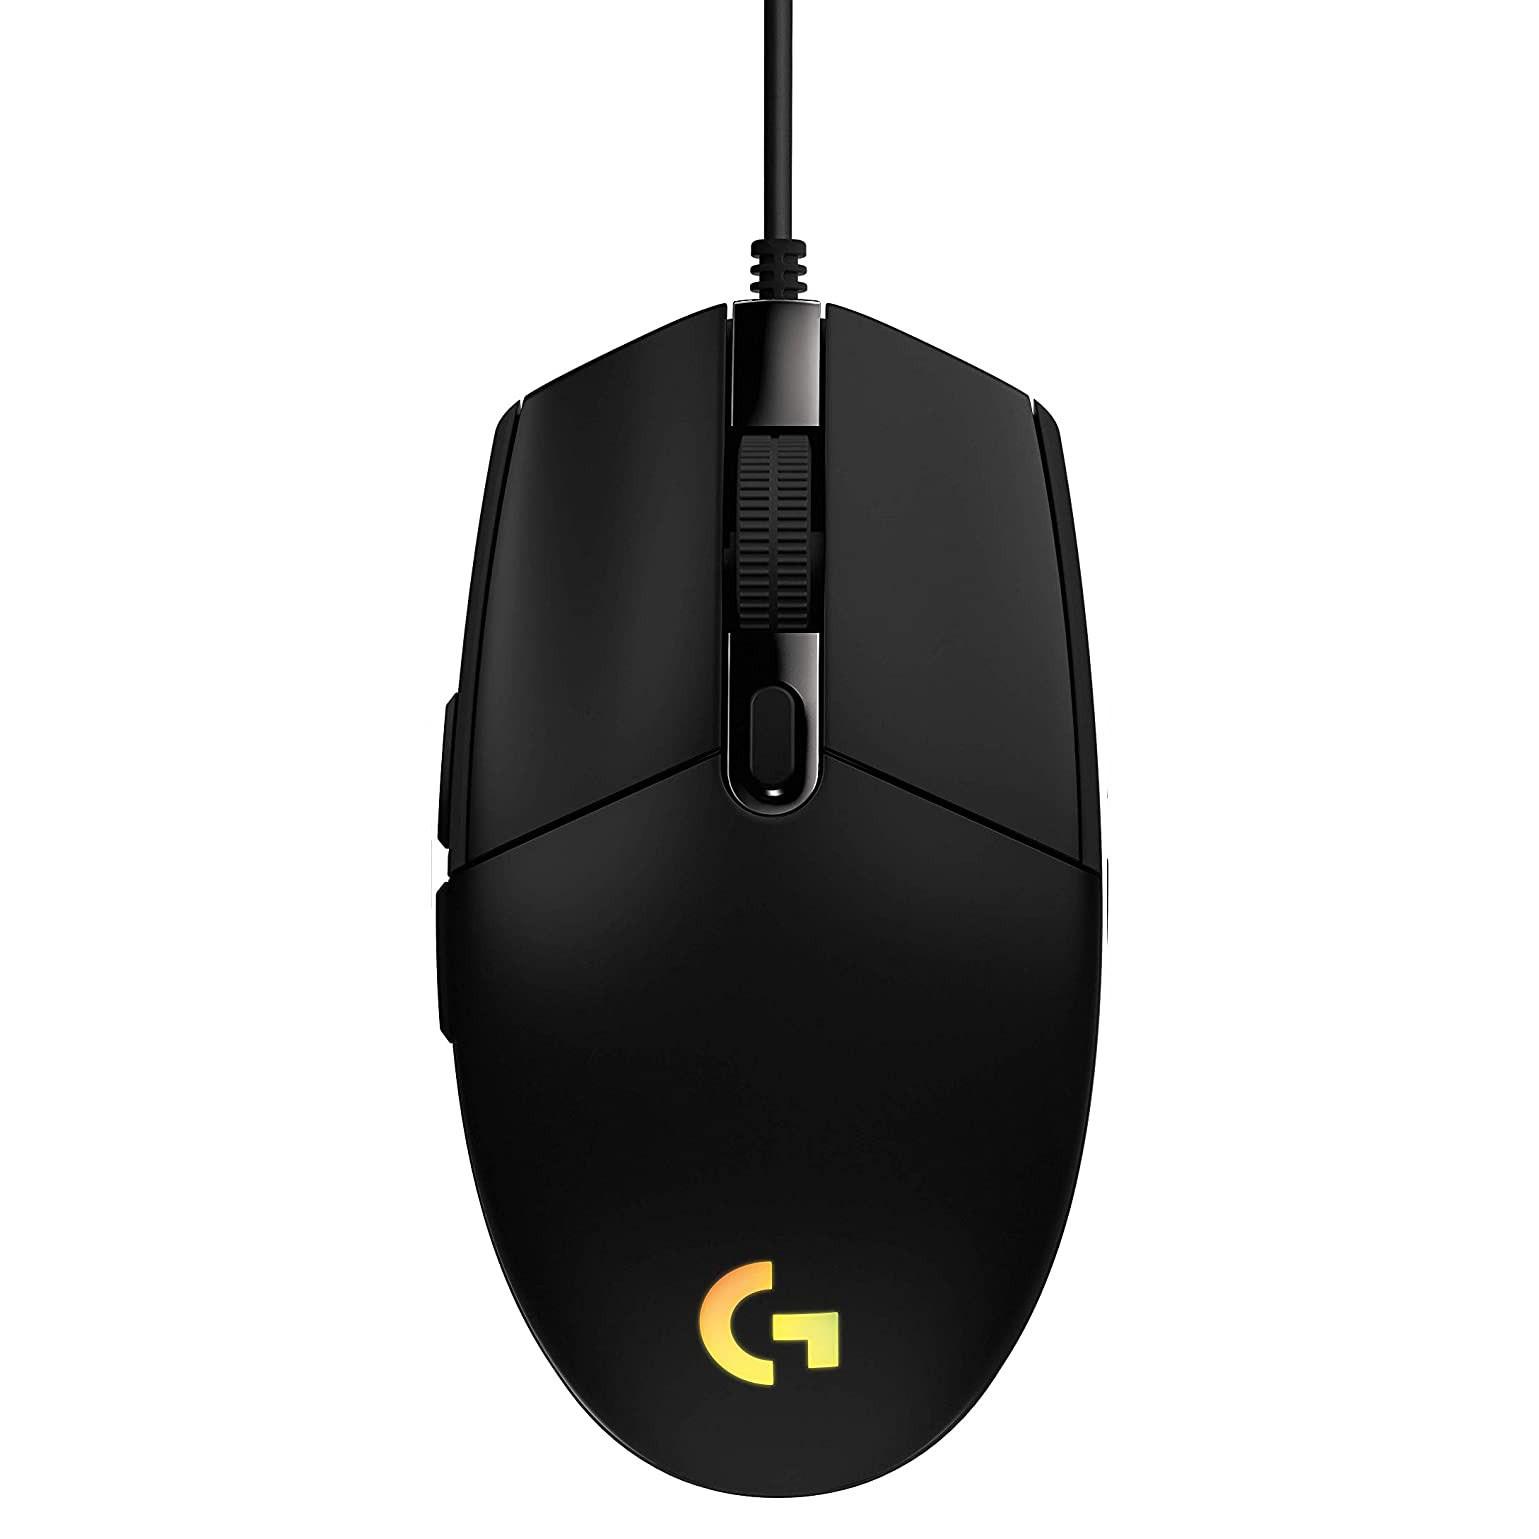 Mouse Logitech G203 Lightsync RGB